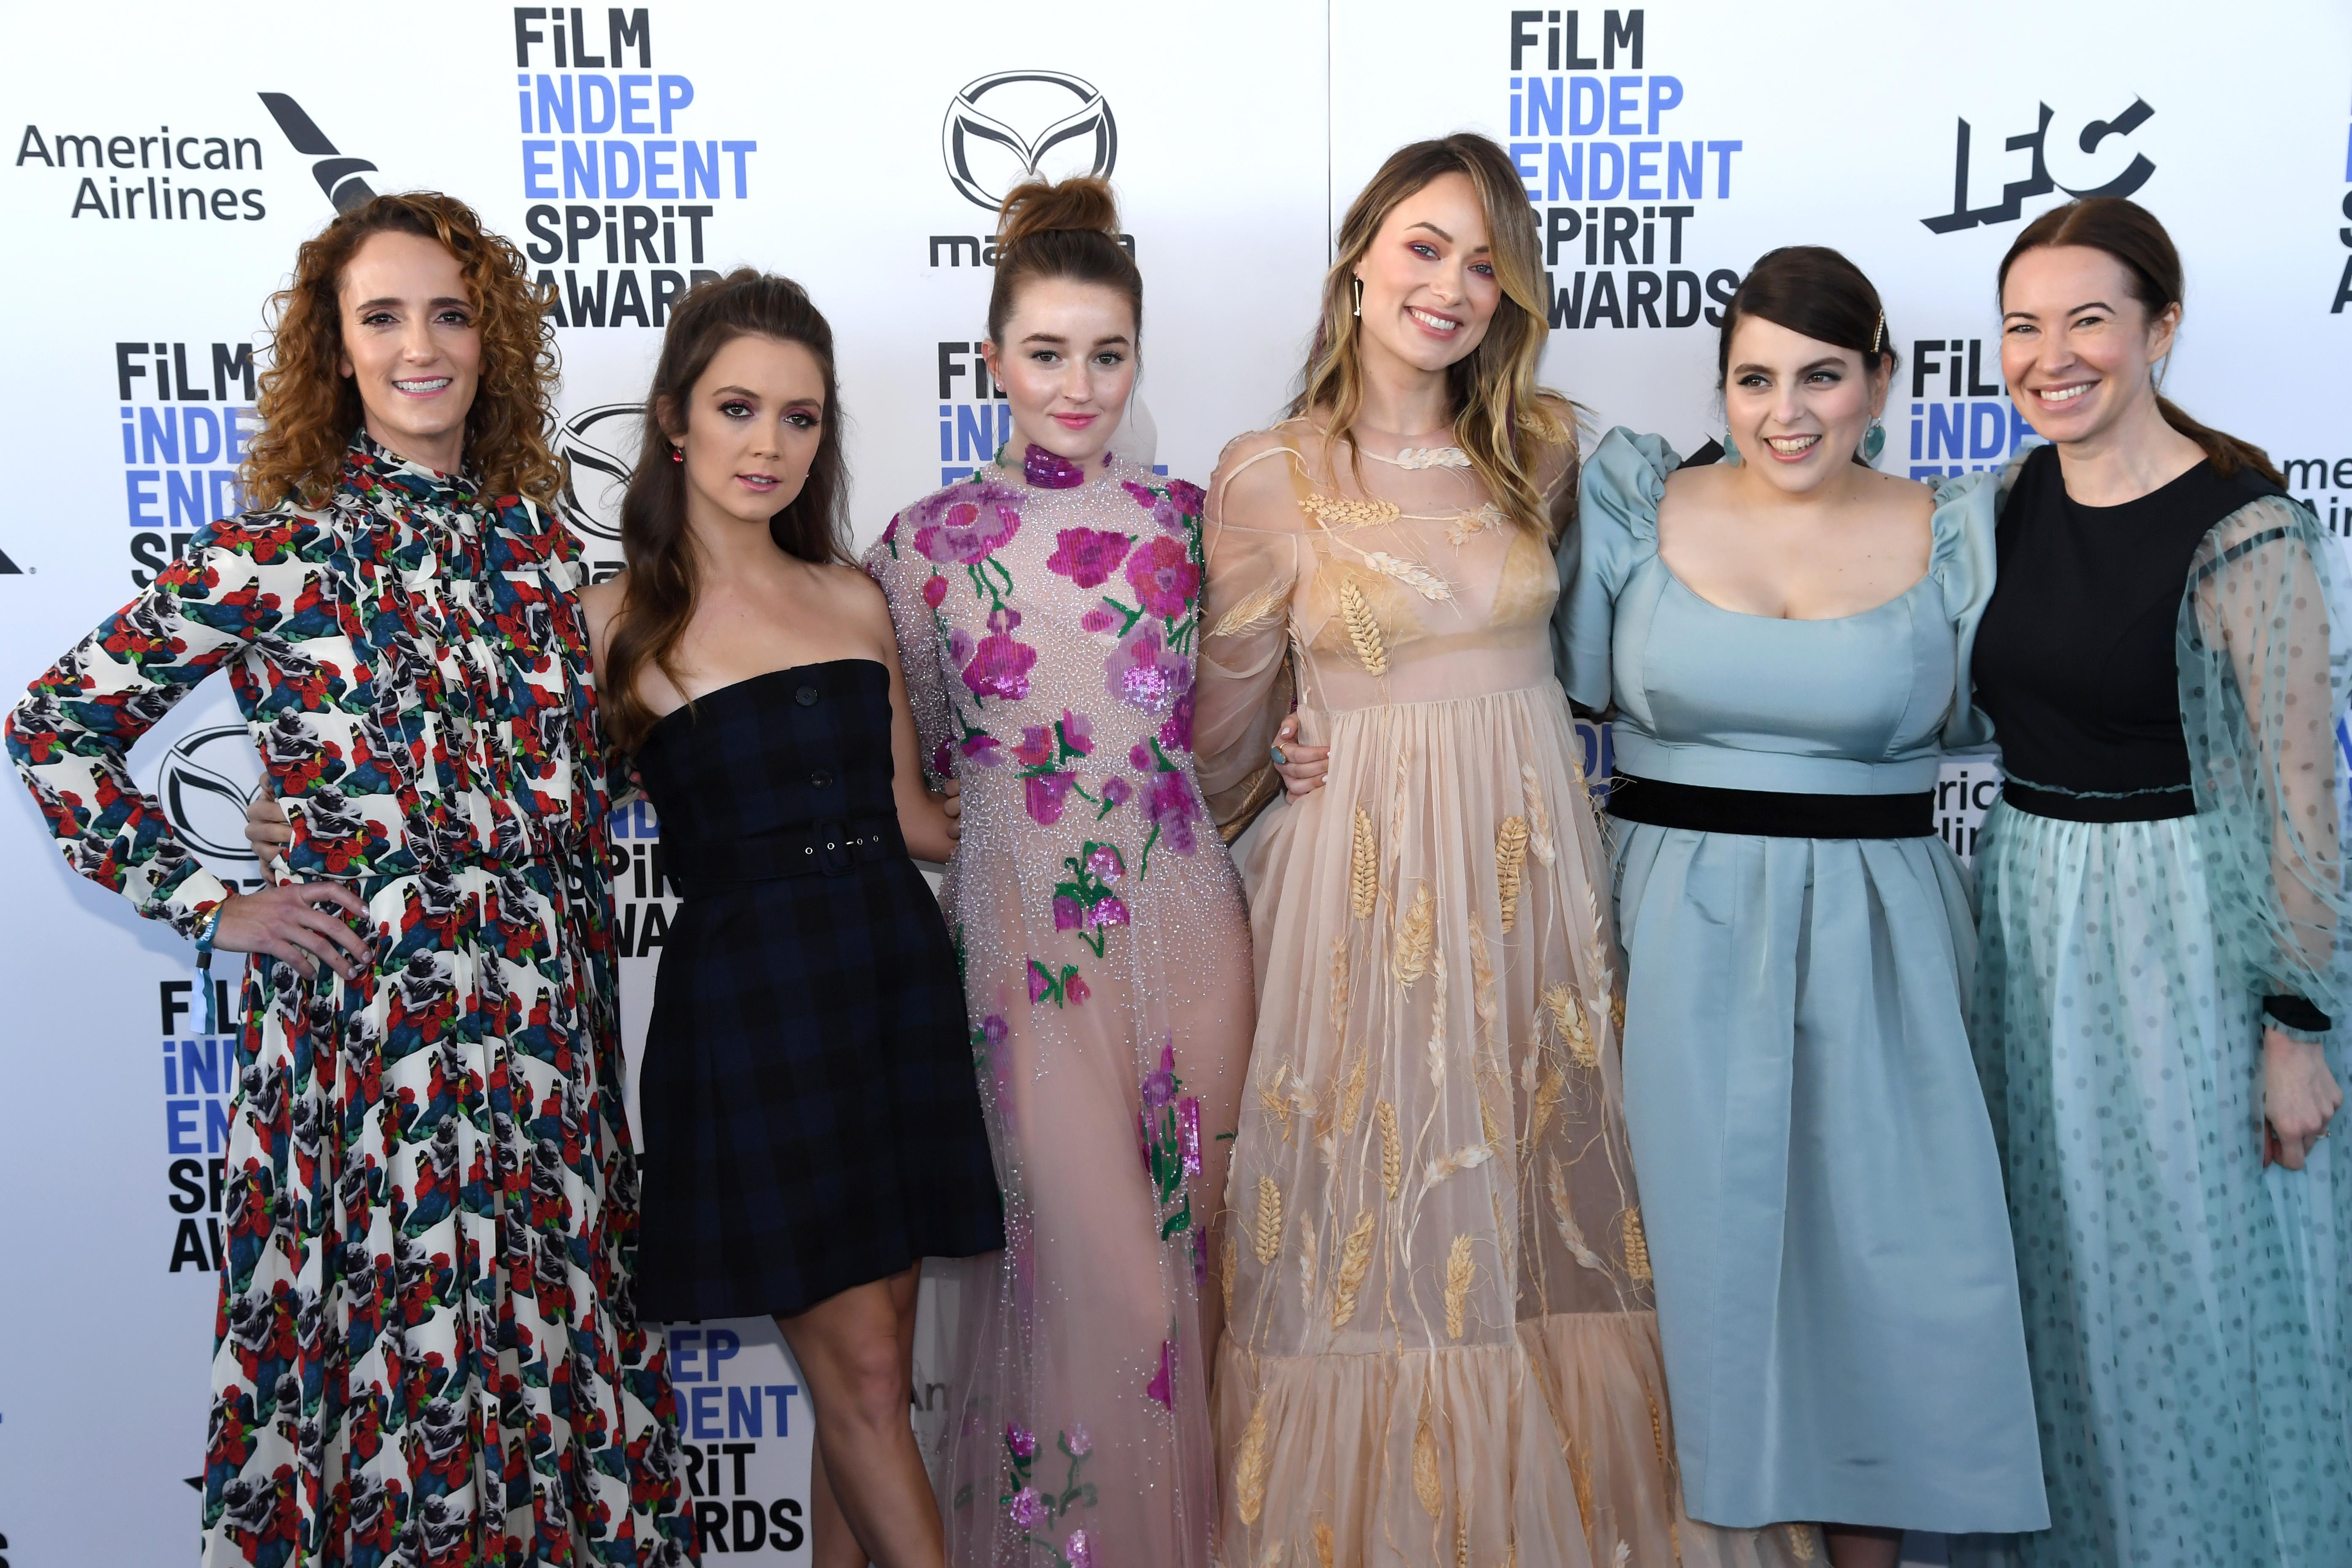 Olivia Wilde, Jessica Elbaum, Beanie Feldstein, Kaitlyn Dever, Katie Silberman, and Billie Lourd at an event for 35th Film Independent Spirit Awards (2020)